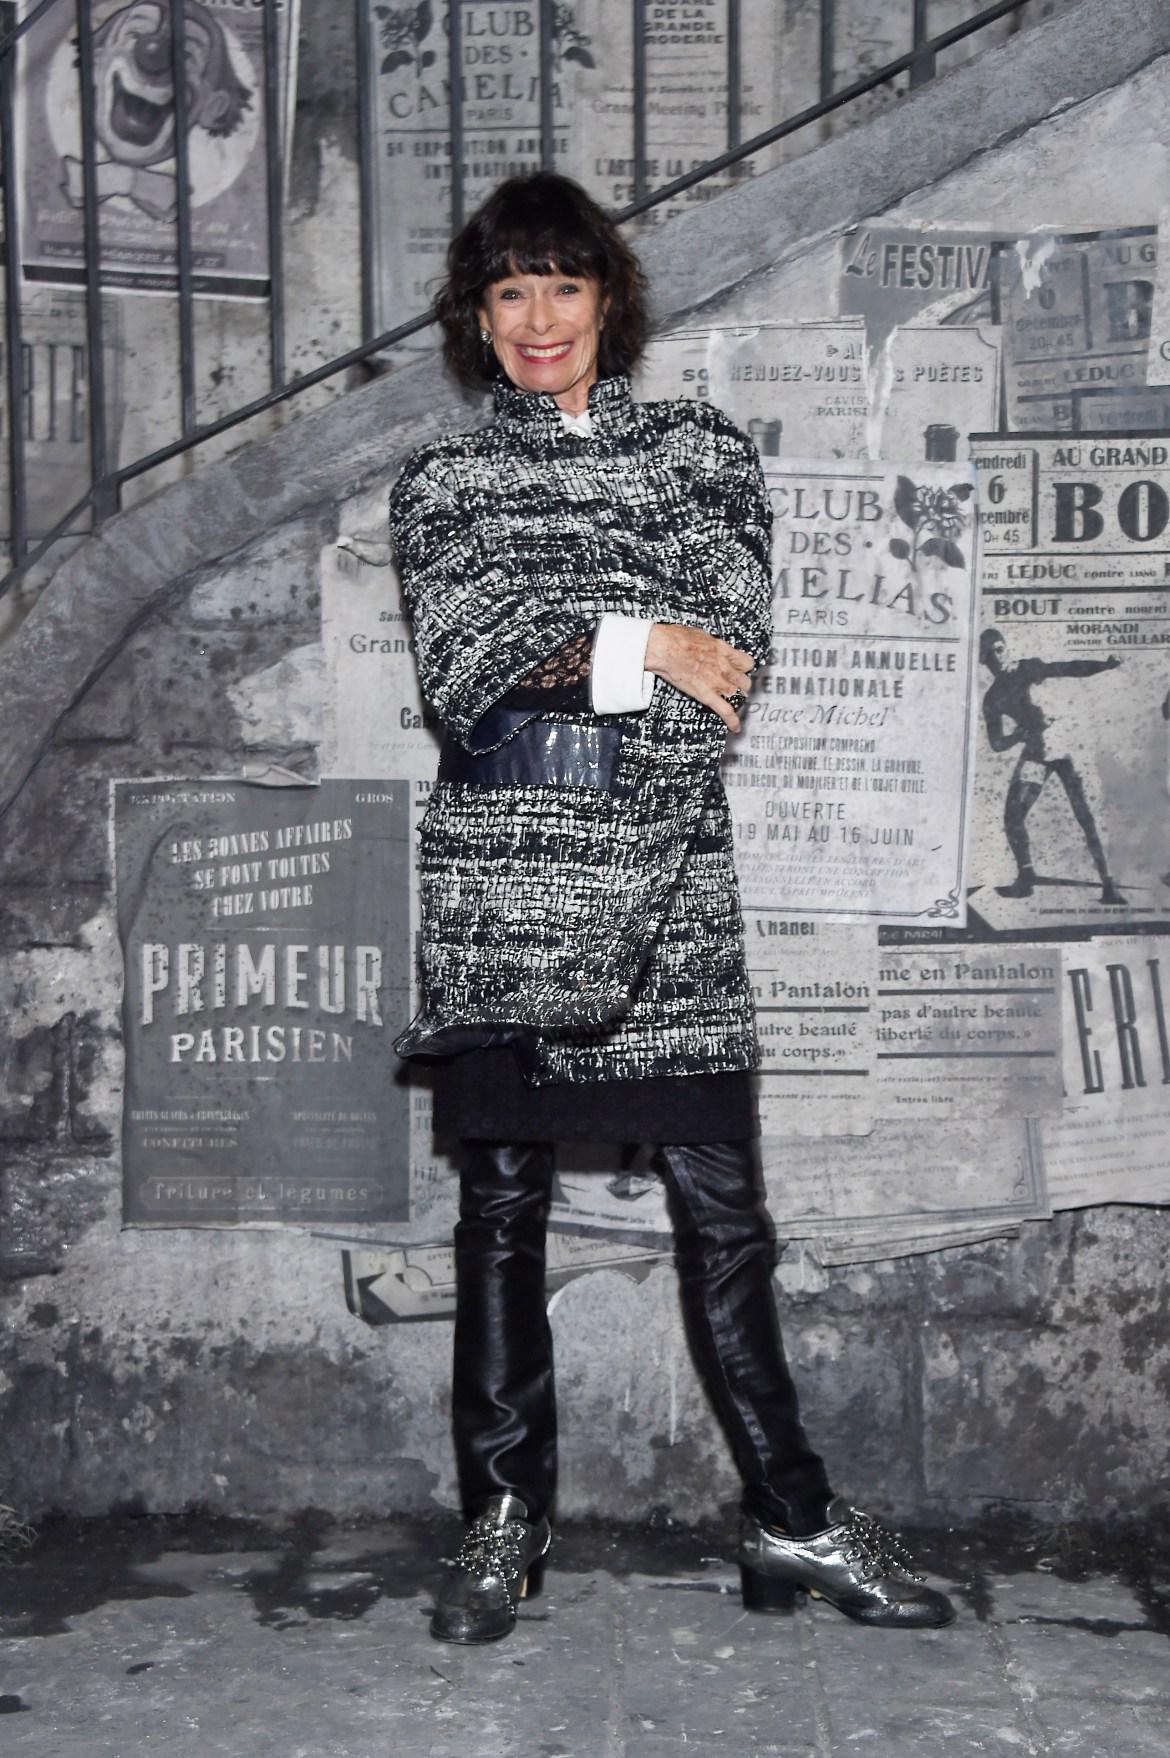 Geraldine CHAPLIN_Paris in Rome 2015-16_Teatro N°5-Cinecitta Studios-Rome_Picture by Aldo Castoldi